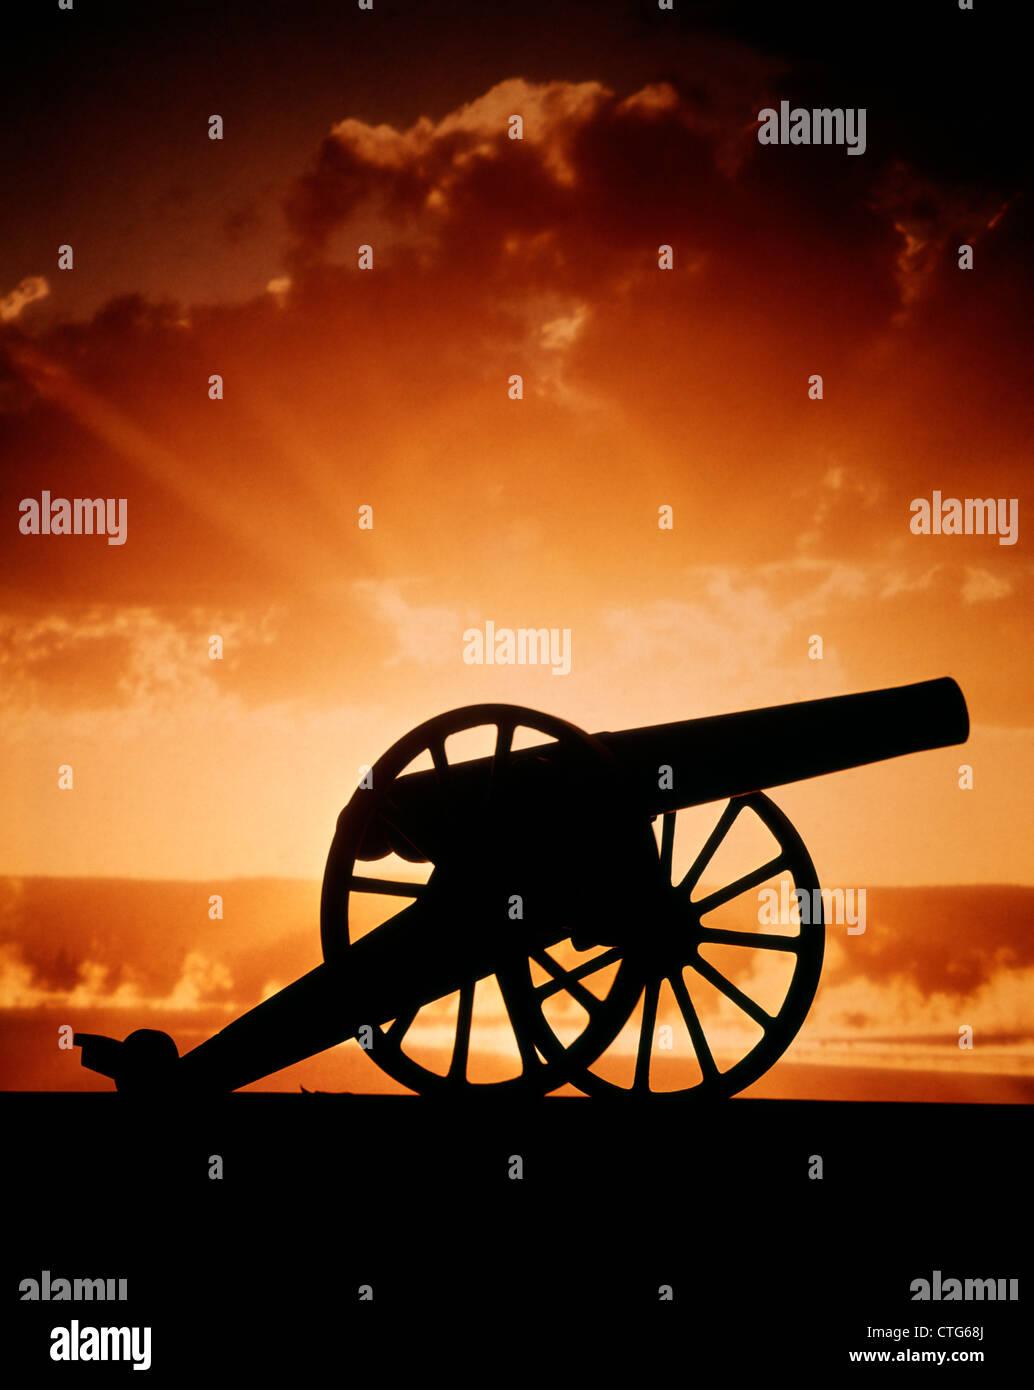 SILHOUETTE CIVIL WAR ERA CANNON SUNSET - Stock Image